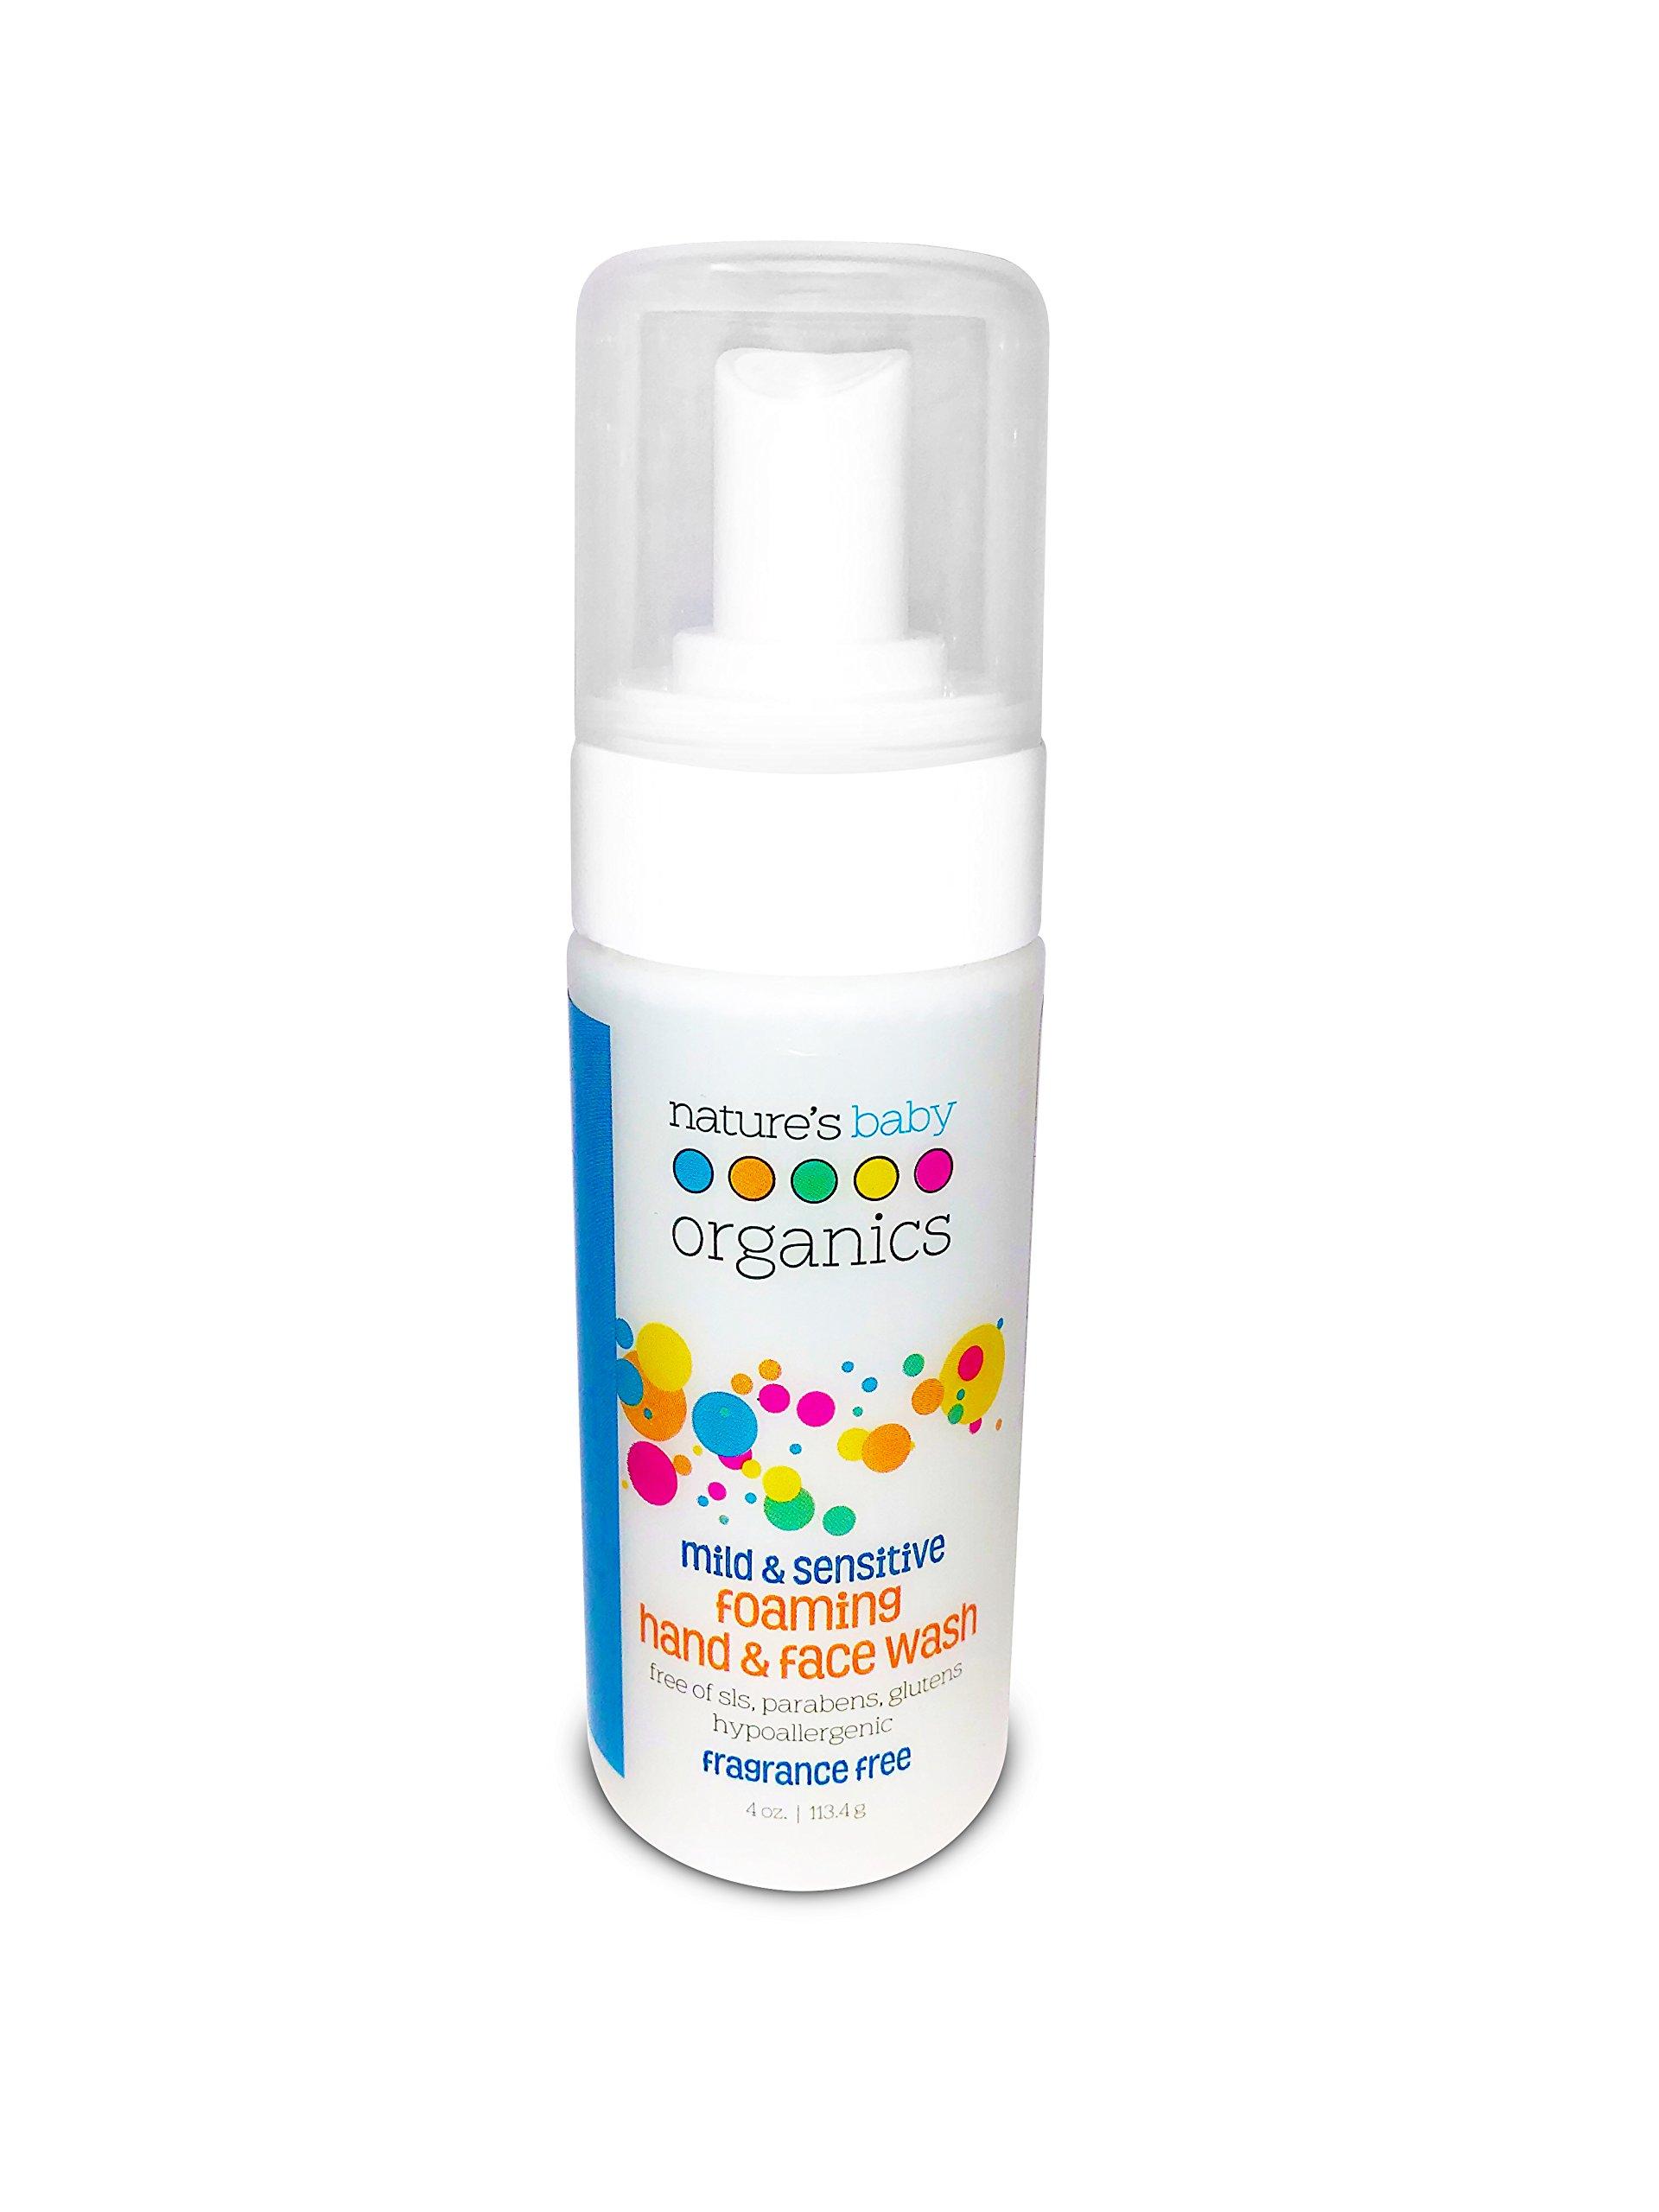 Nature's Baby Organics Nature s Baby Organics Mild Sensitive Foaming Hand Face Wash Fragrance Free 4 oz 113 4 g